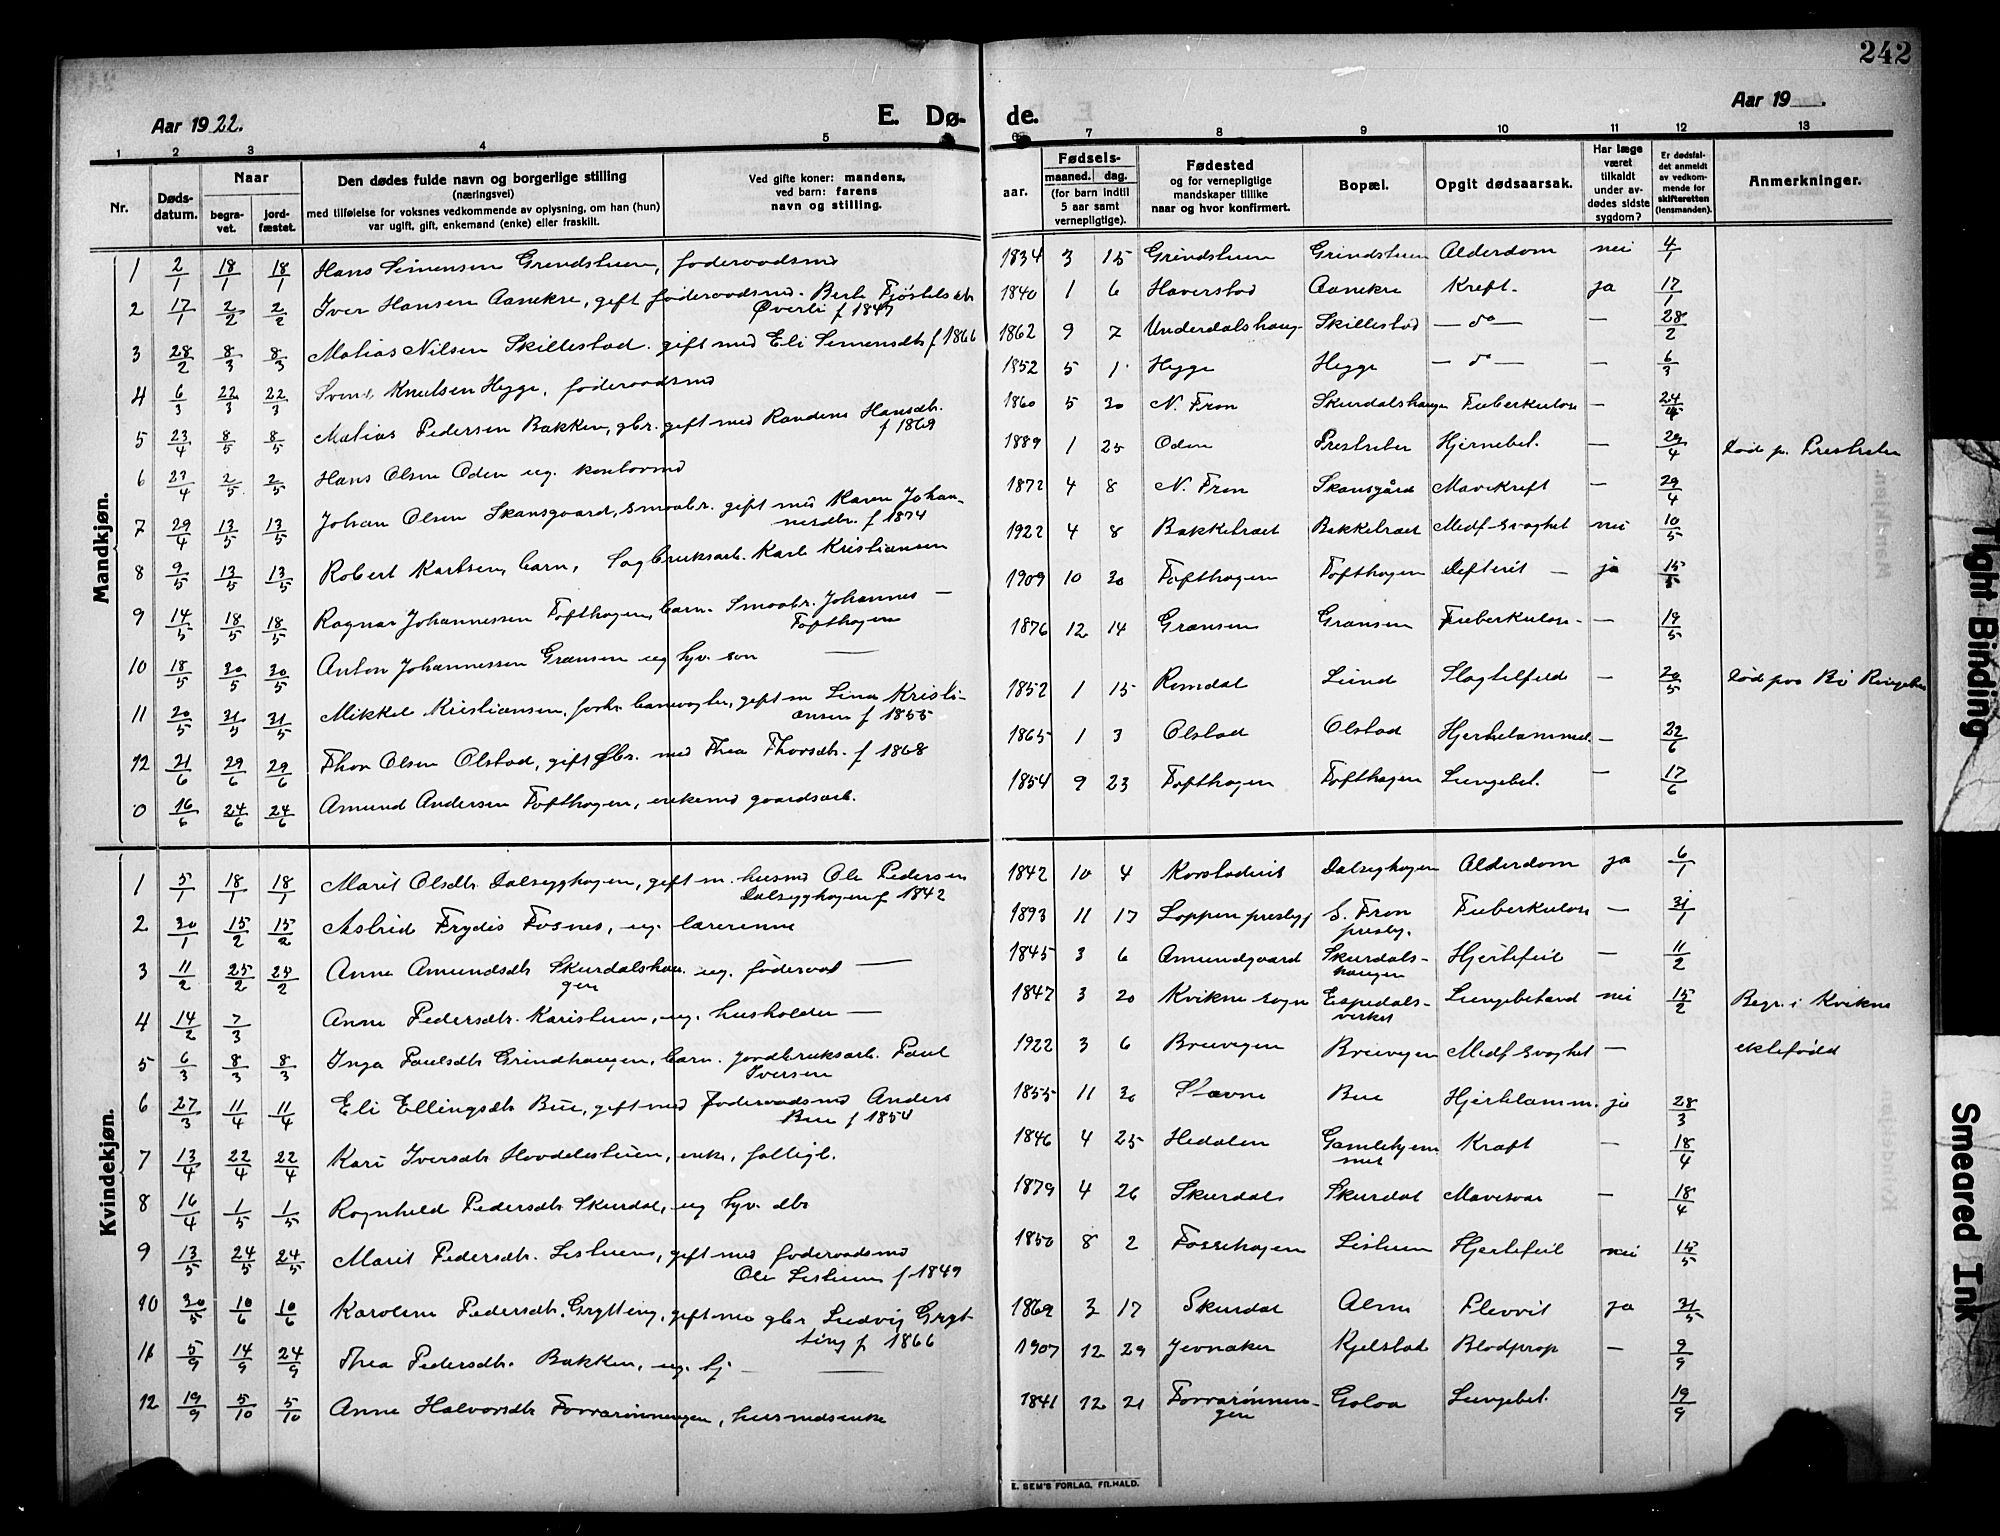 SAH, Sør-Fron prestekontor, H/Ha/Hab/L0005: Klokkerbok nr. 5, 1912-1930, s. 242